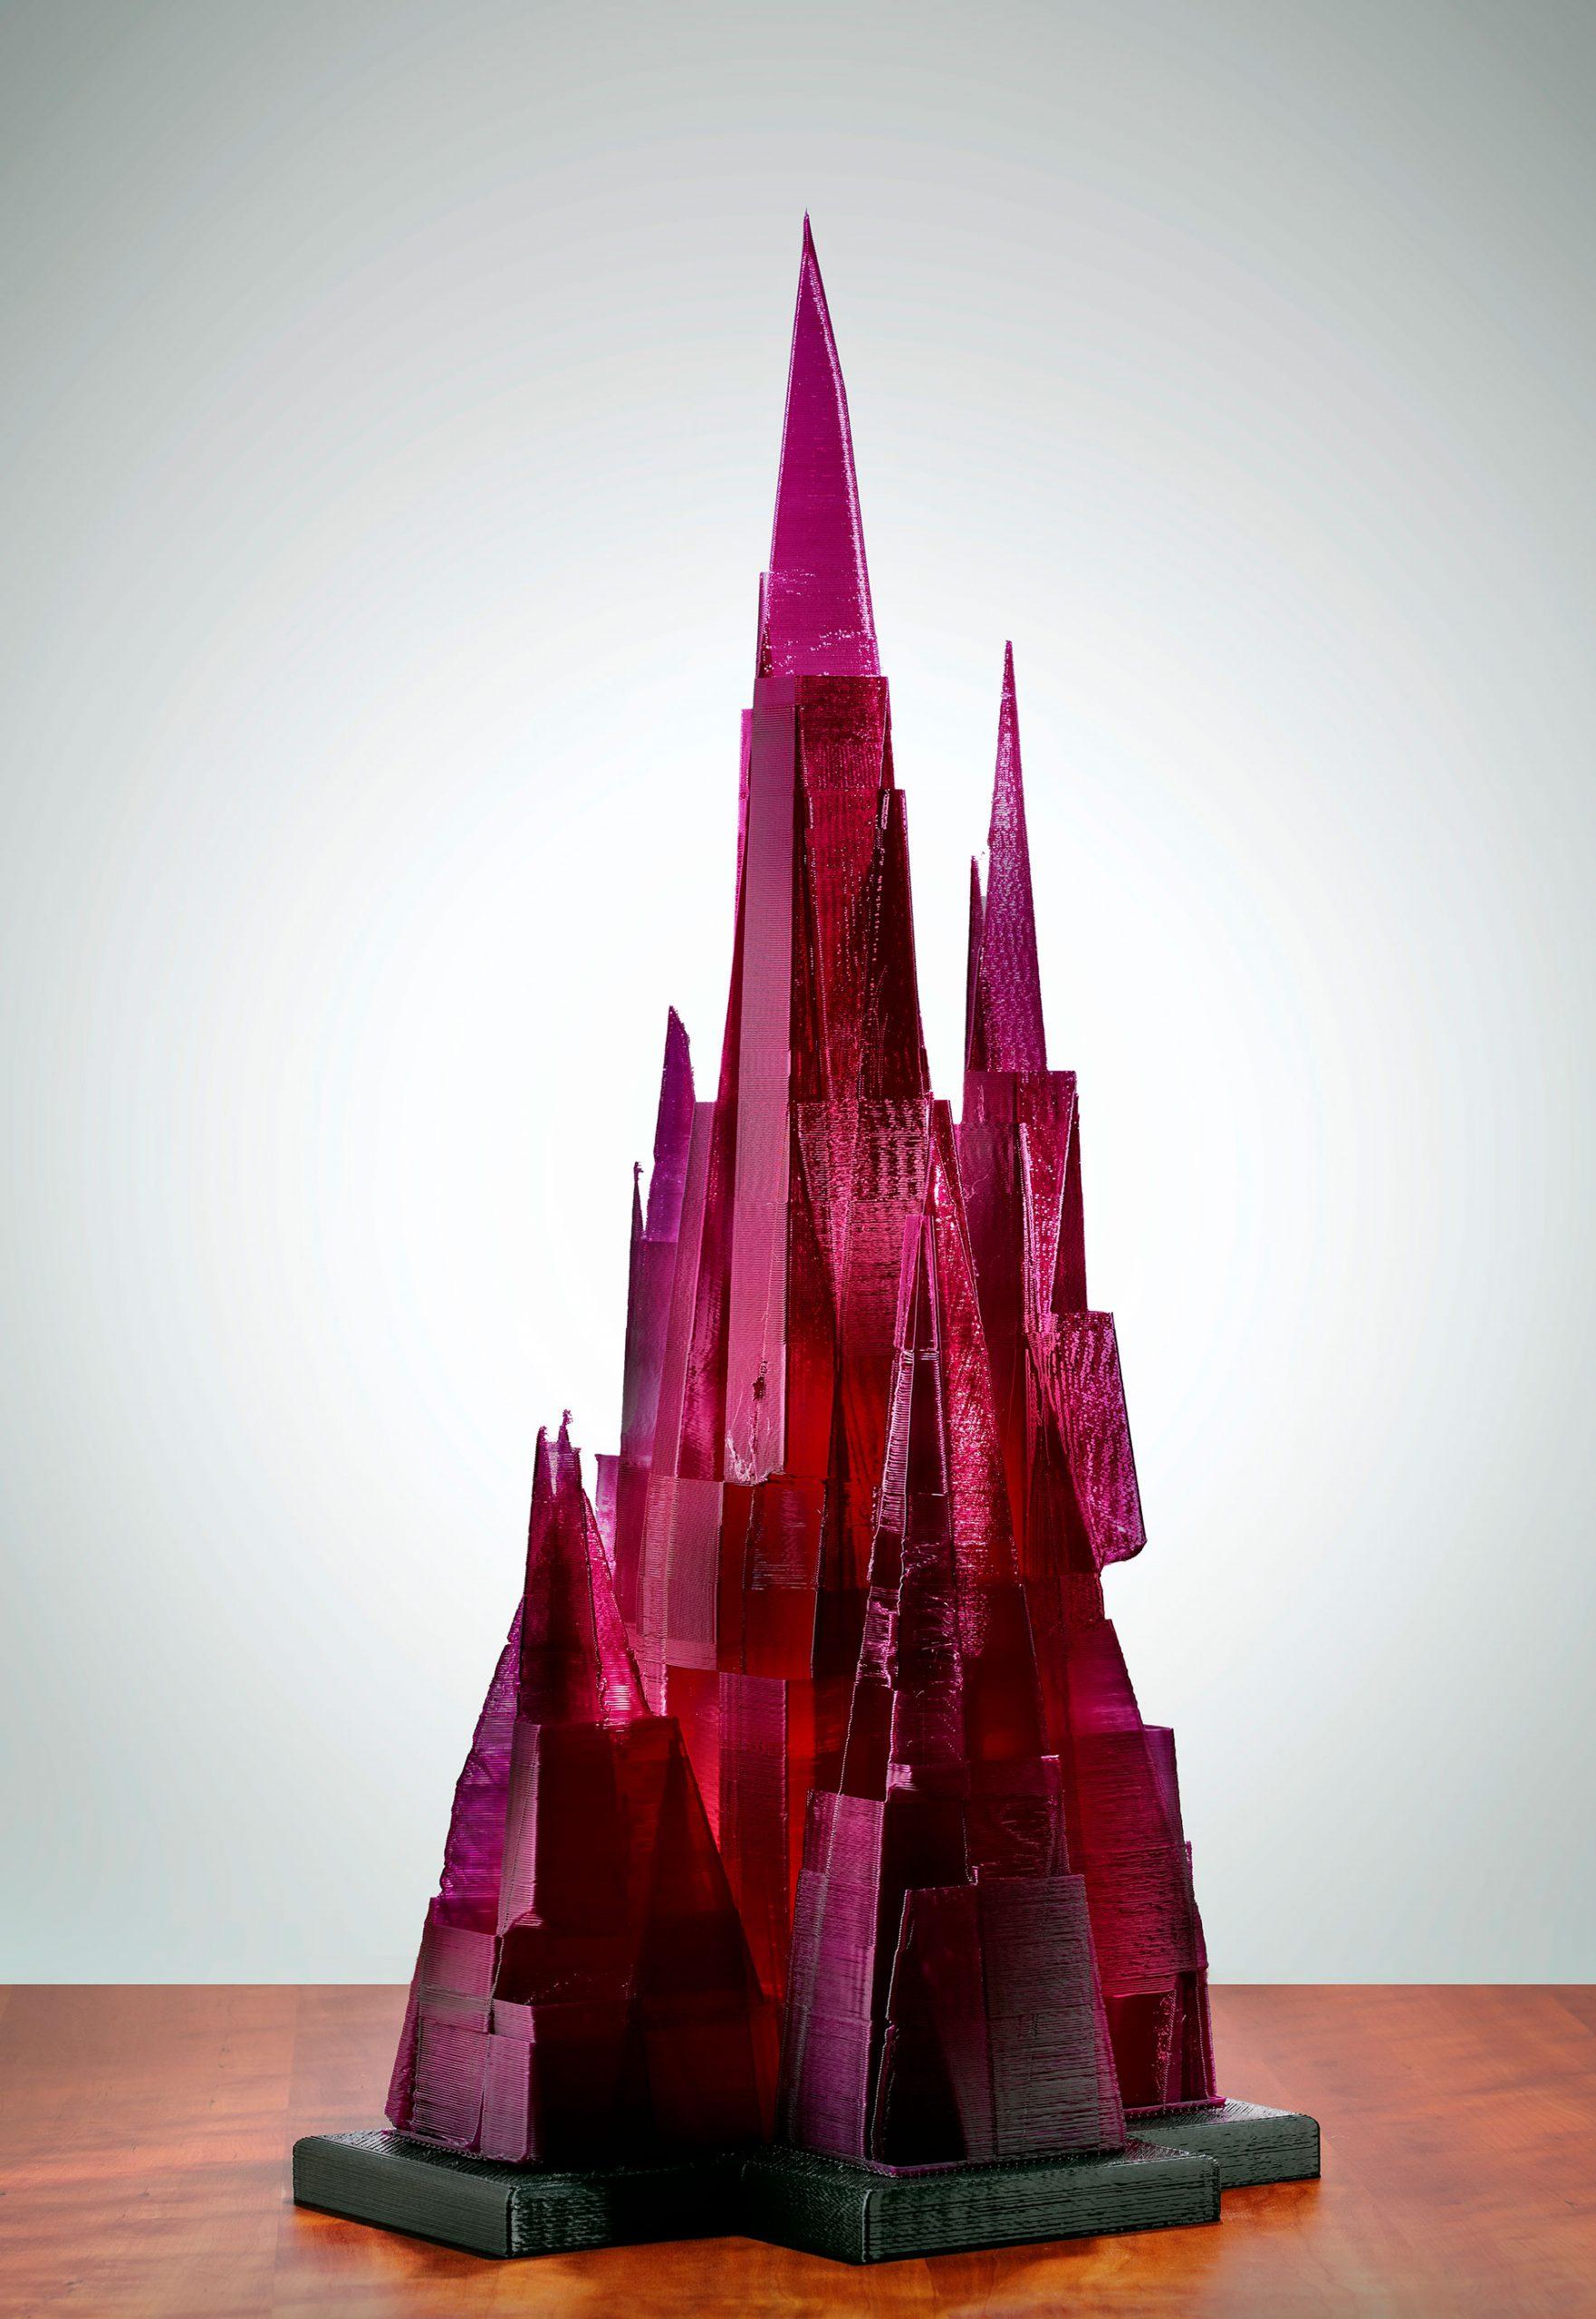 Amethyst City, a fine art 3D printed sculpture - Kevin Caron